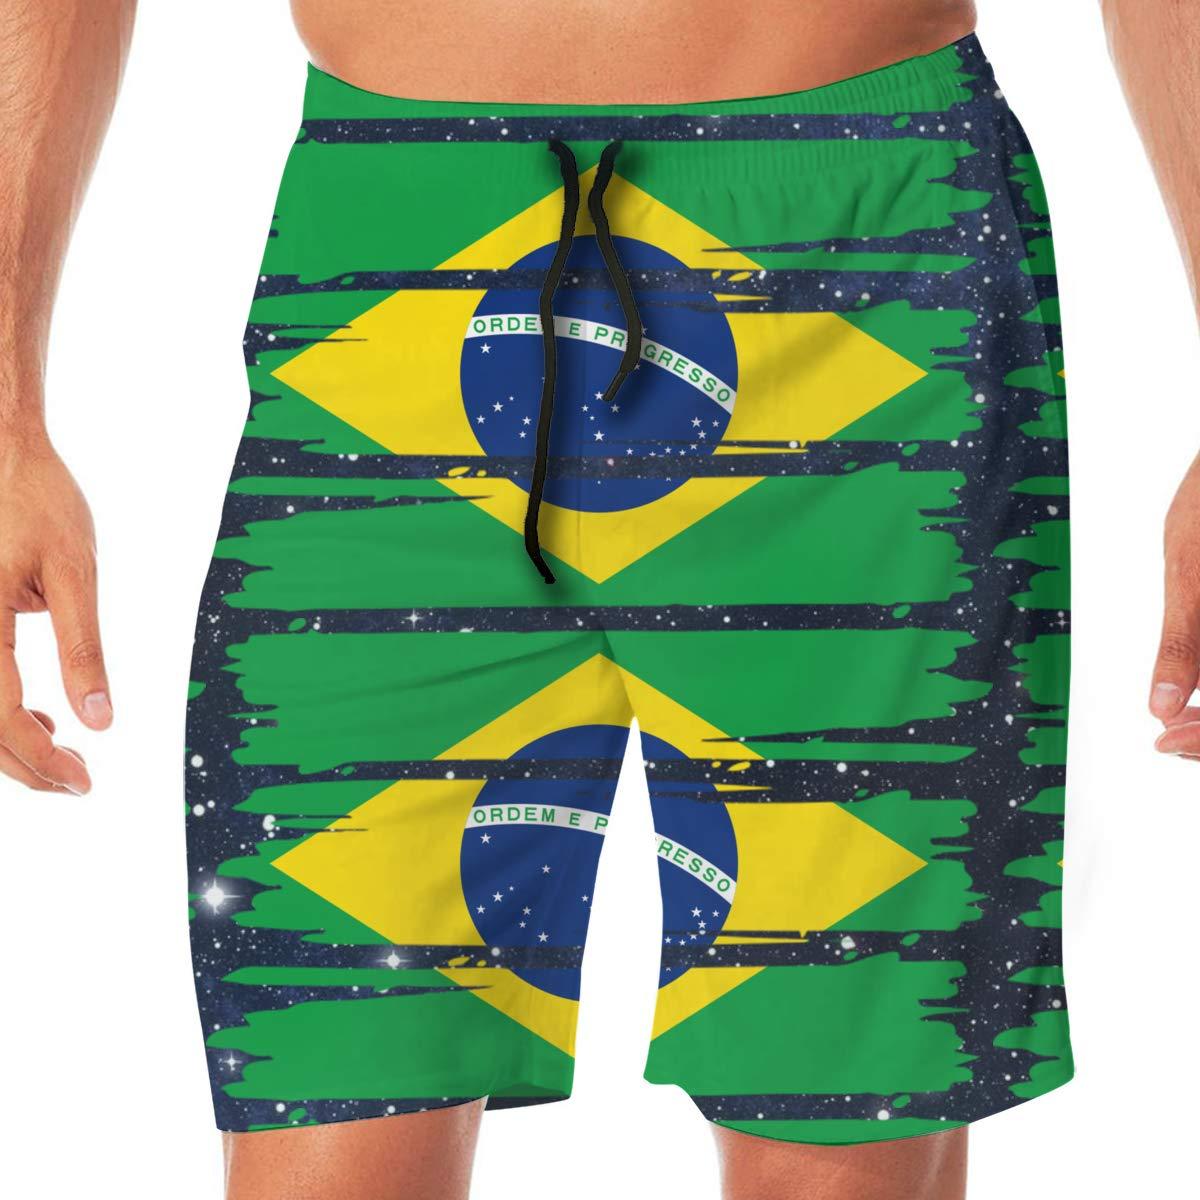 YGE.I.L25 Mens Surfing Boardshorts Brazil Flag Quick Dry Beach Board Short for Men